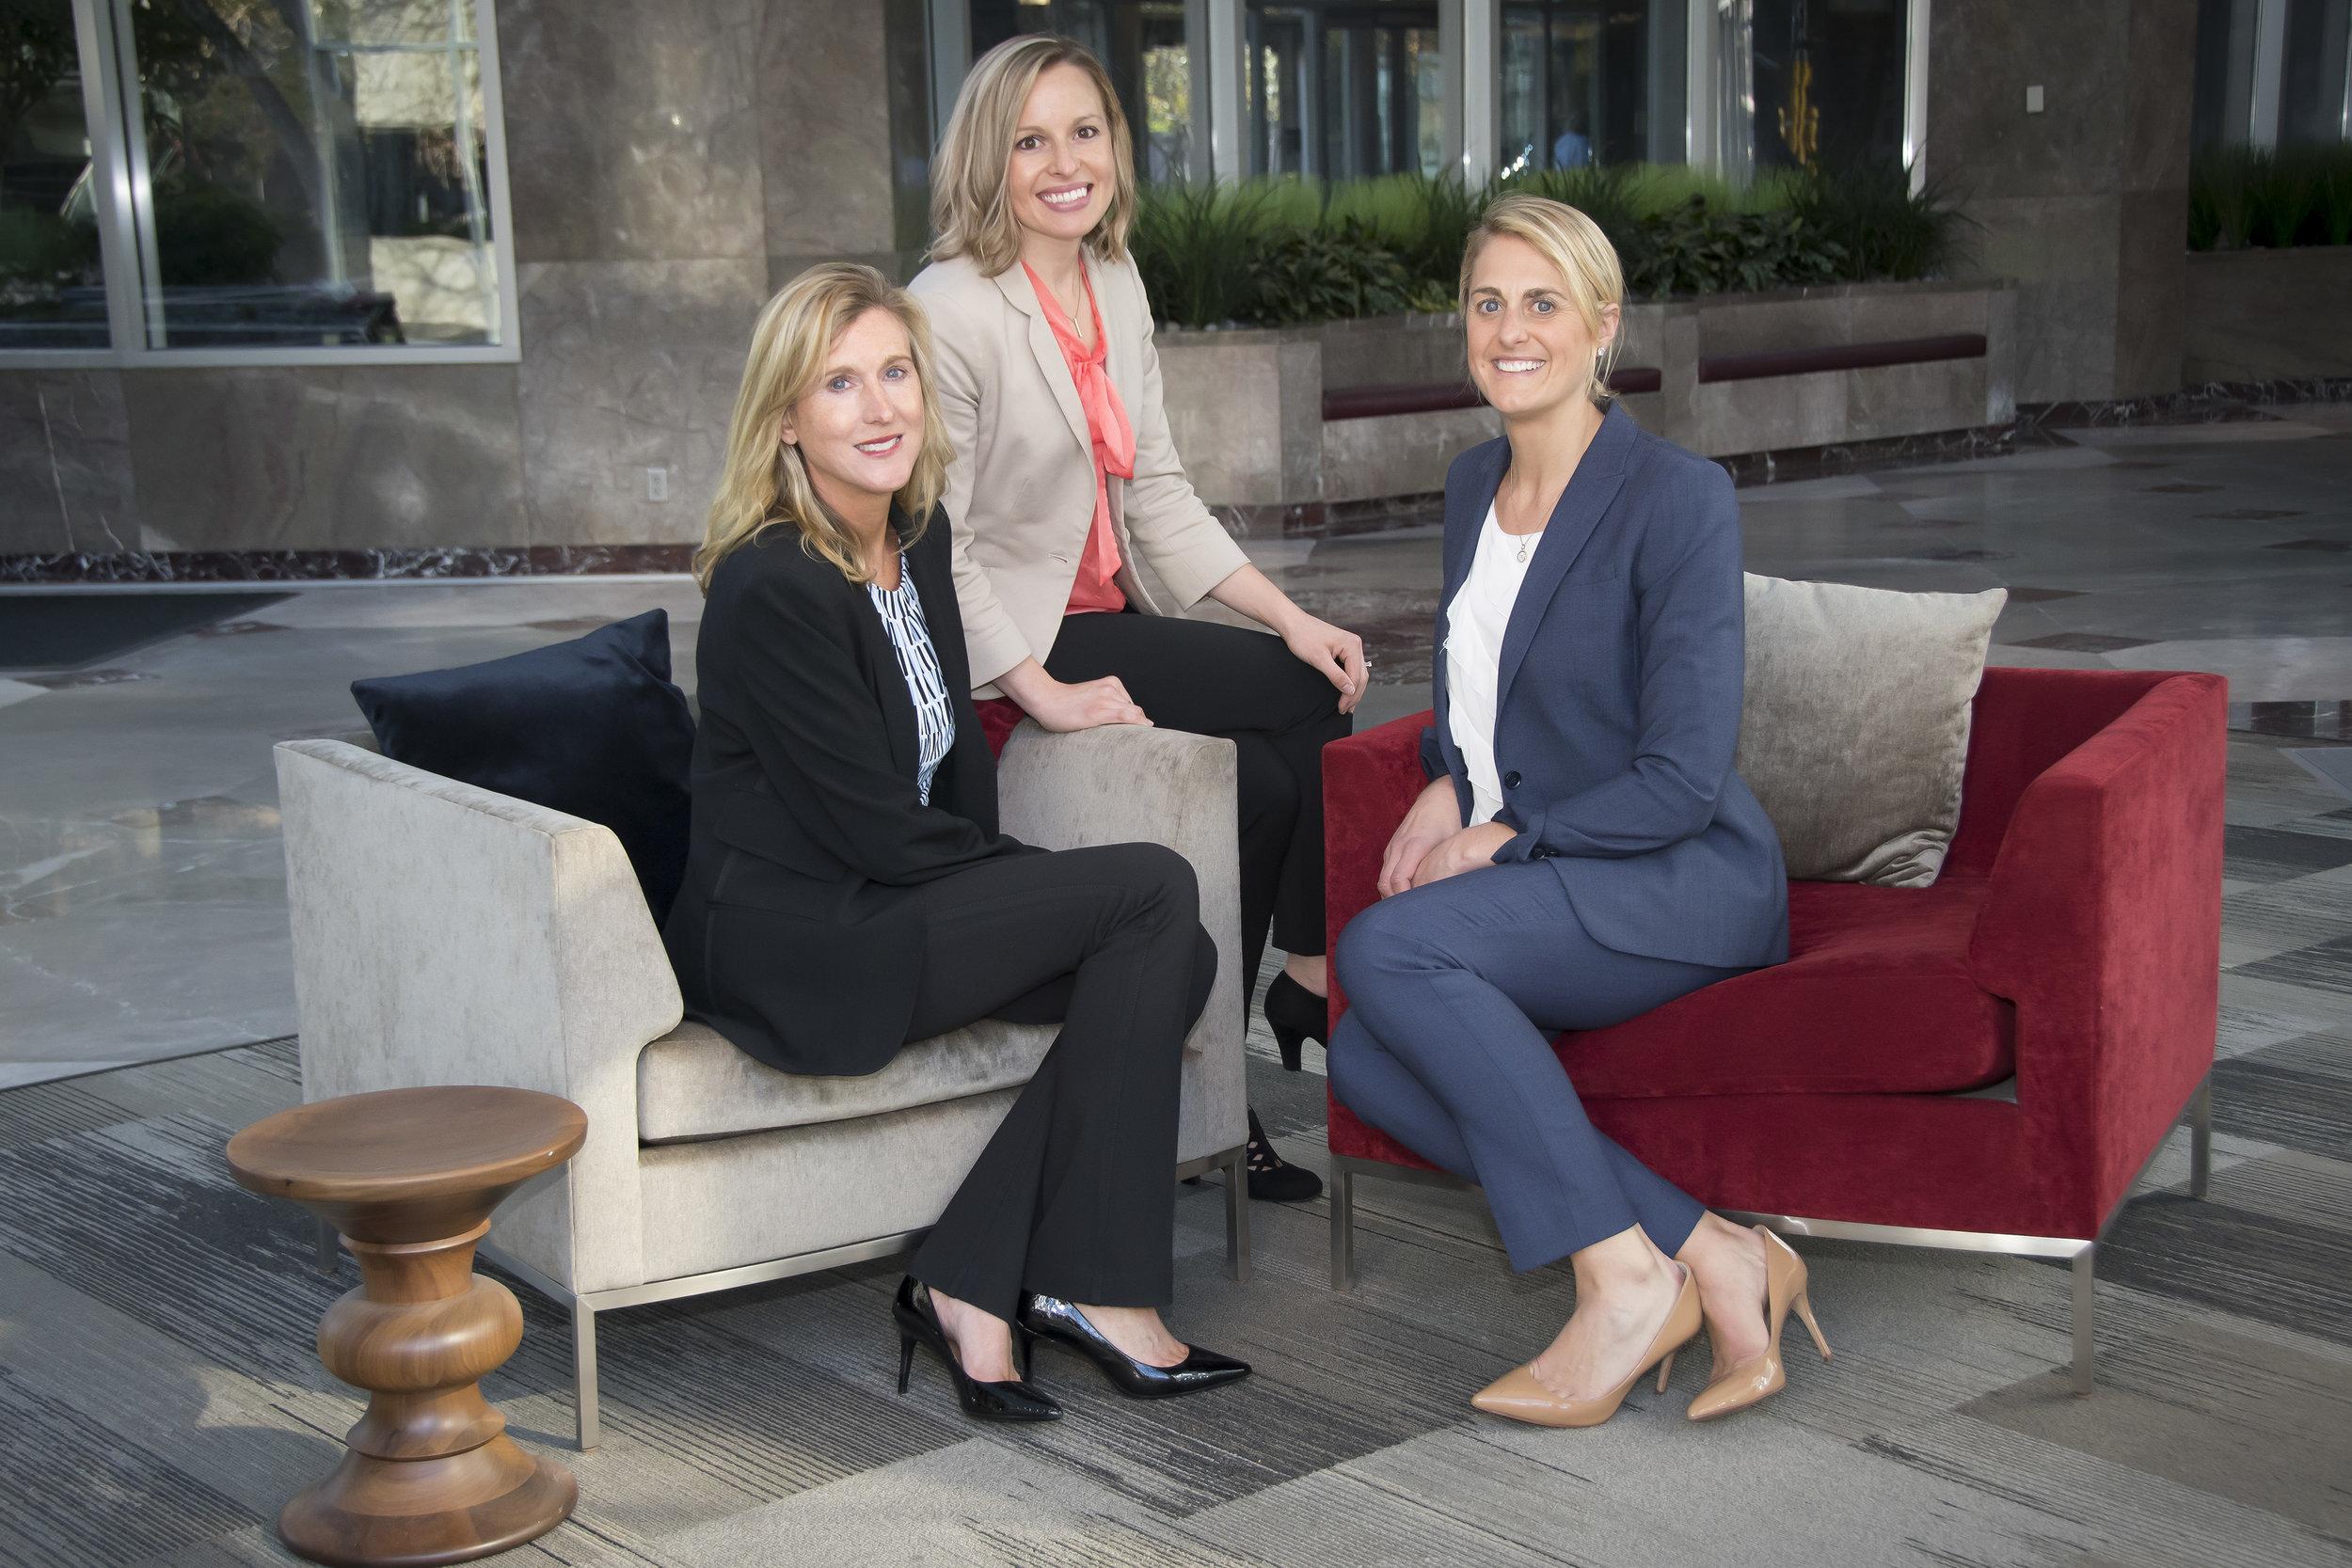 401k Plan Professionals Best Retirement Plan Advisors Minnesota.jpg